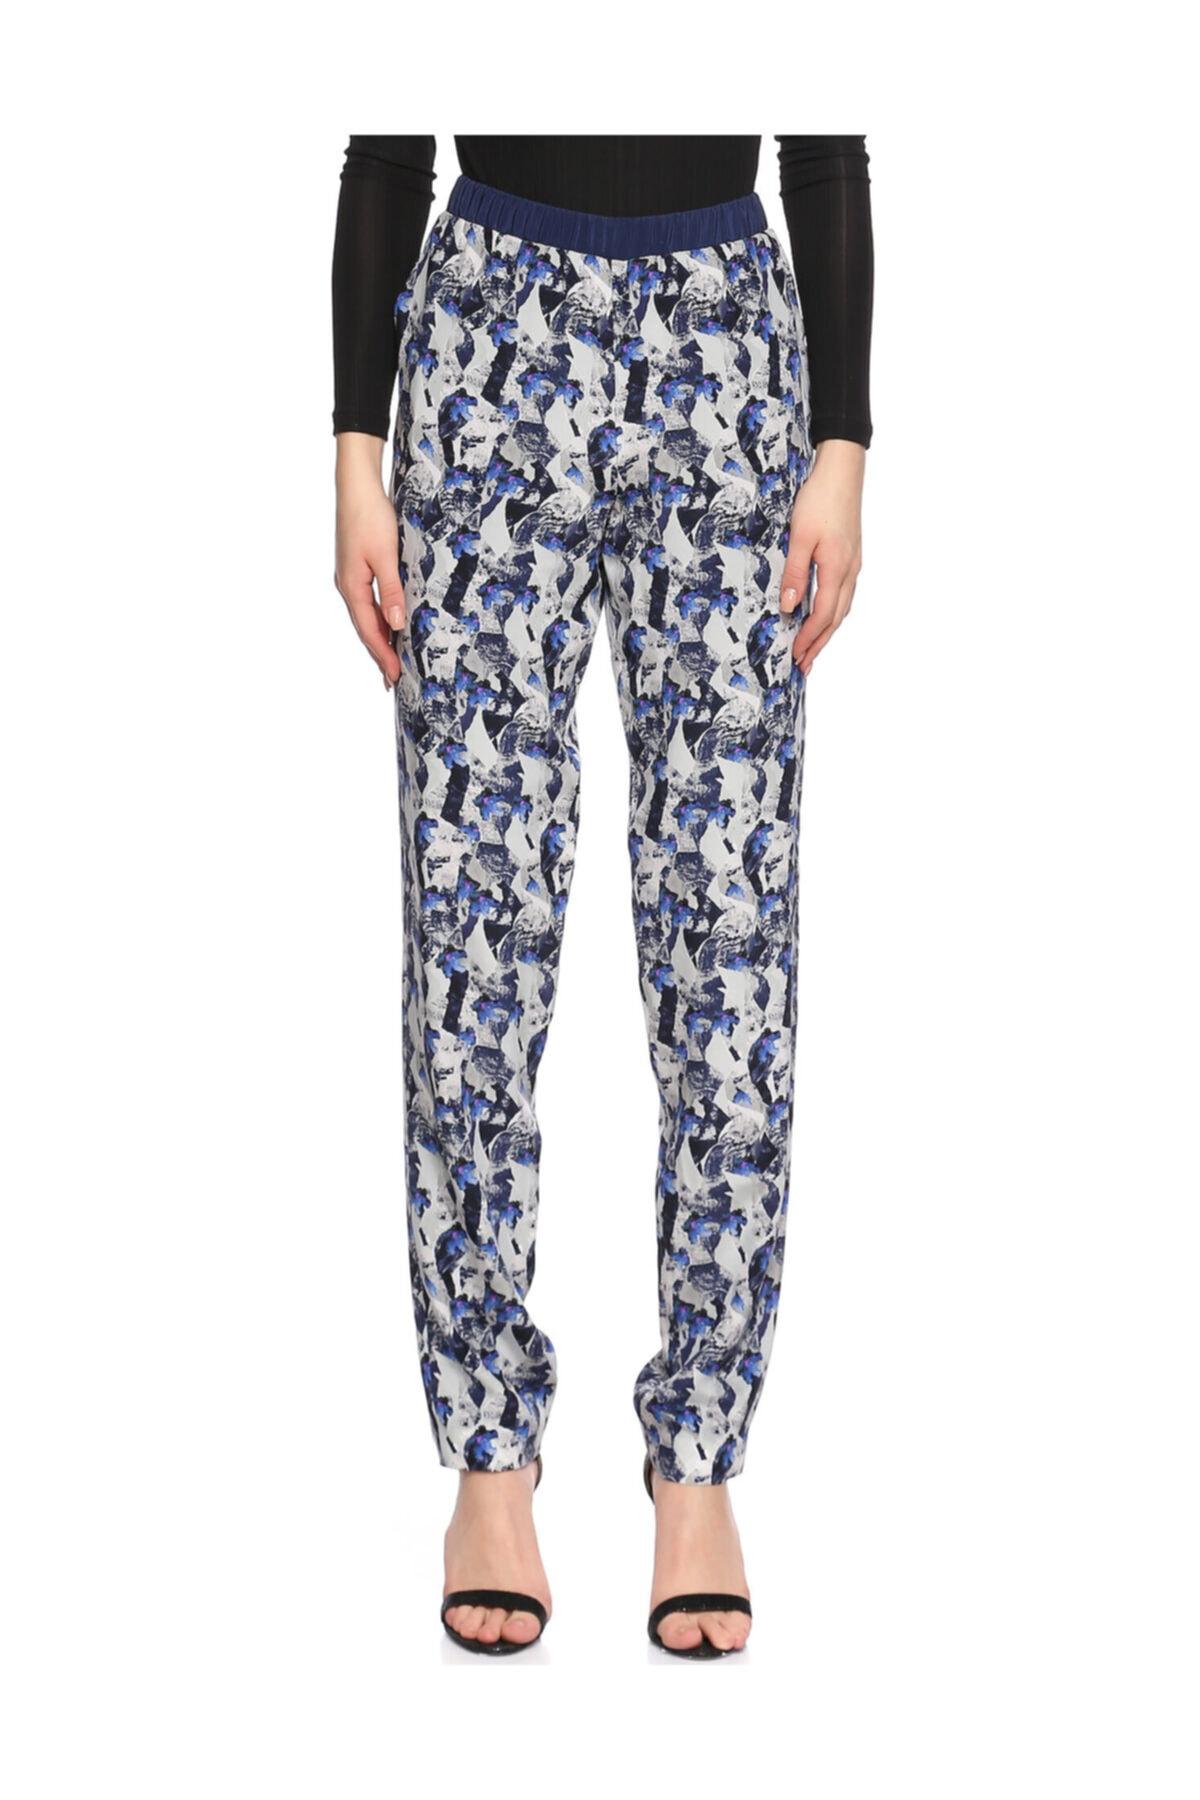 Prabal Gurung Desenli Lacivert Pantolon 1